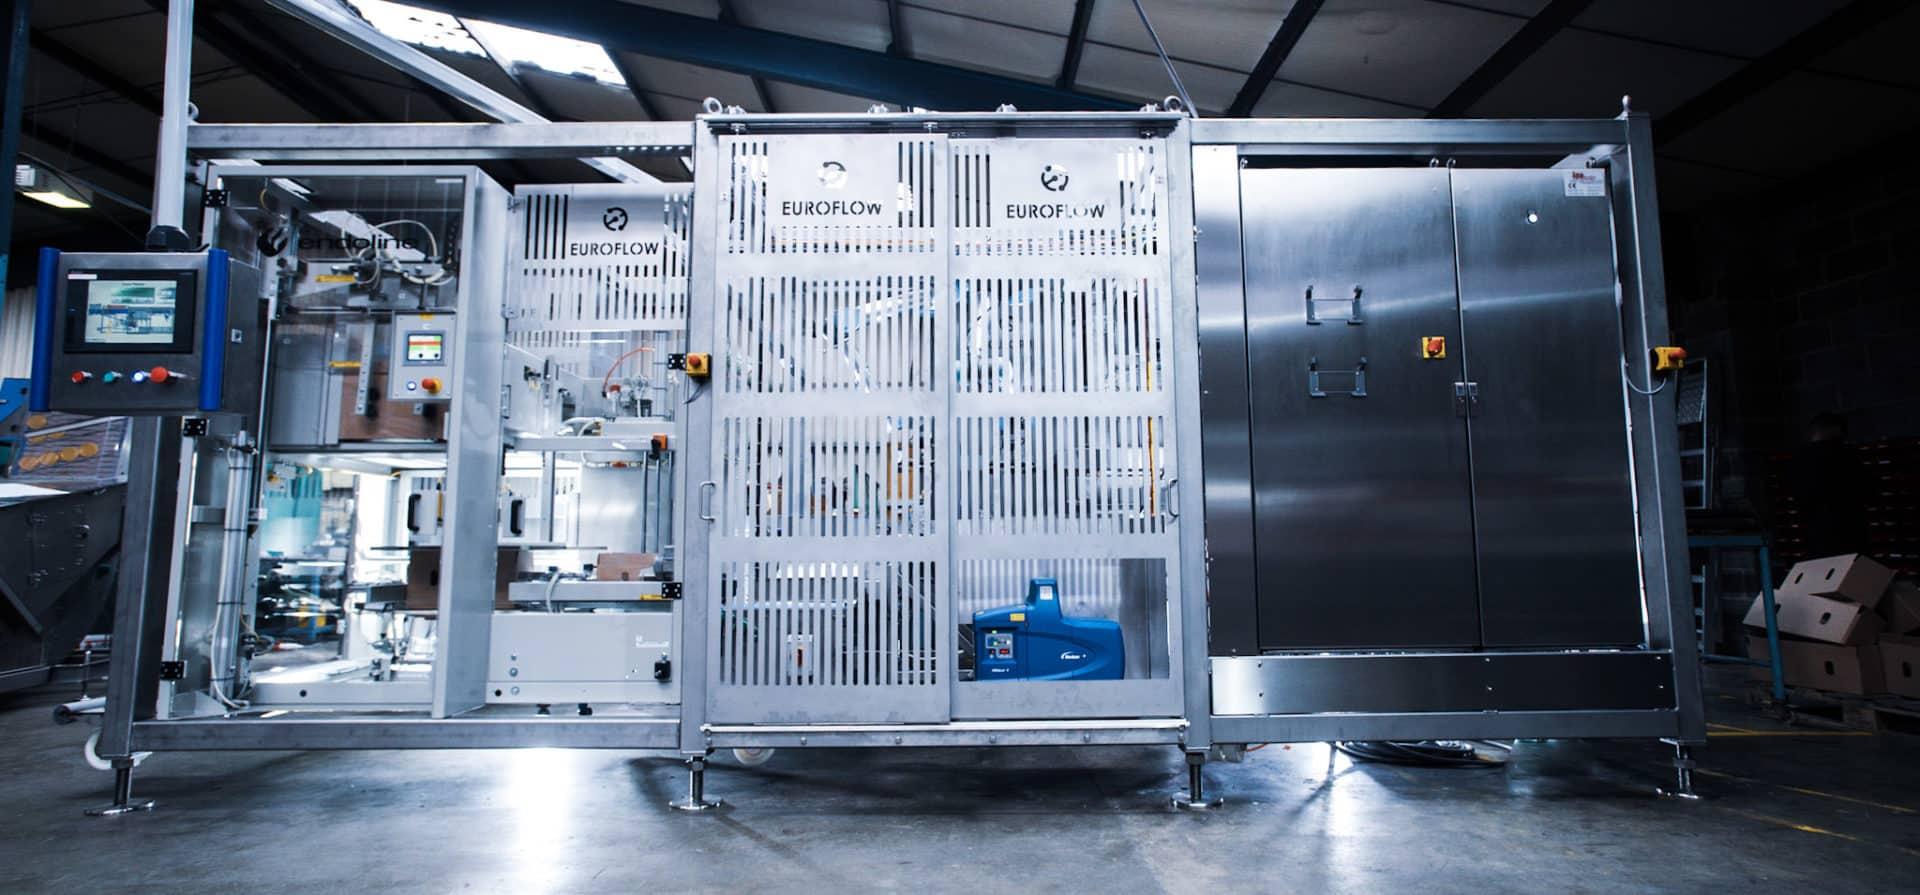 Collaborative Robots - Improve Efficiency Scroller | Euroflow Automation Ltd